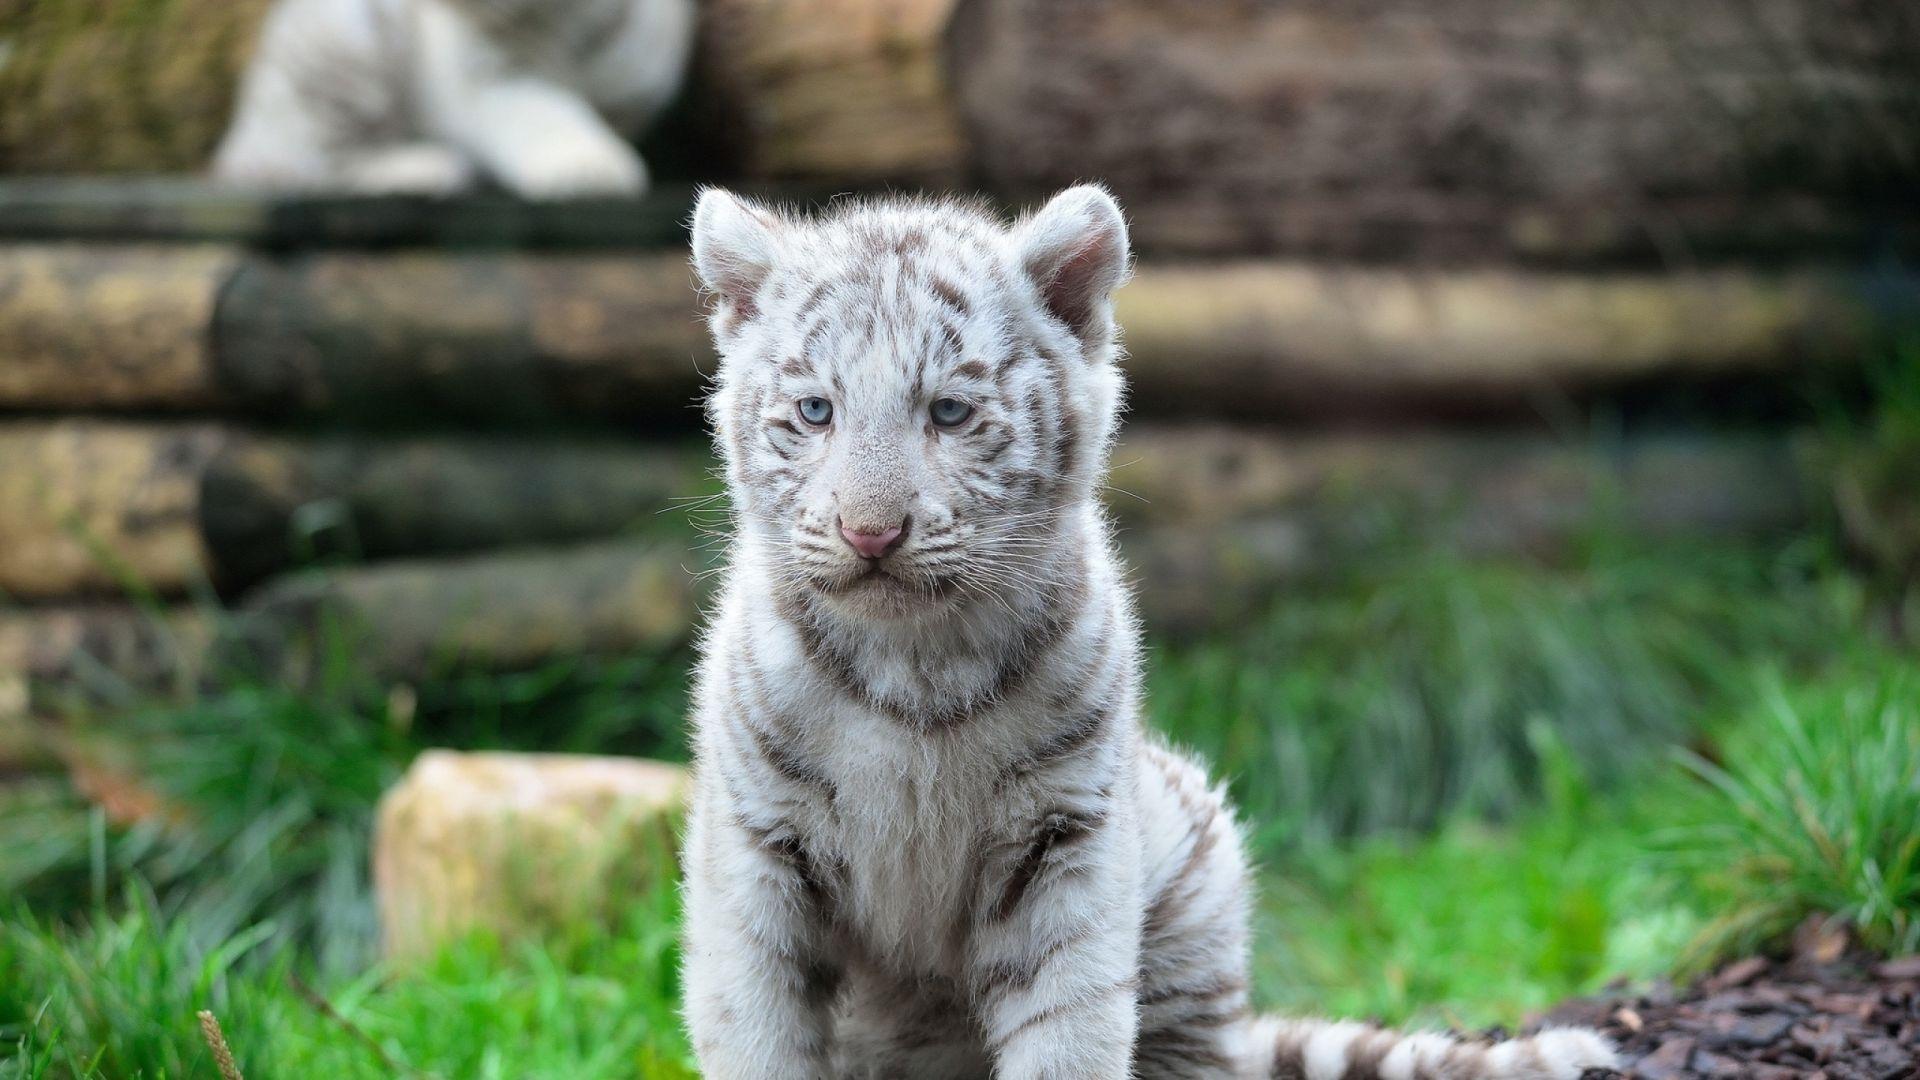 White Tiger baby, Free Download Wallpaper